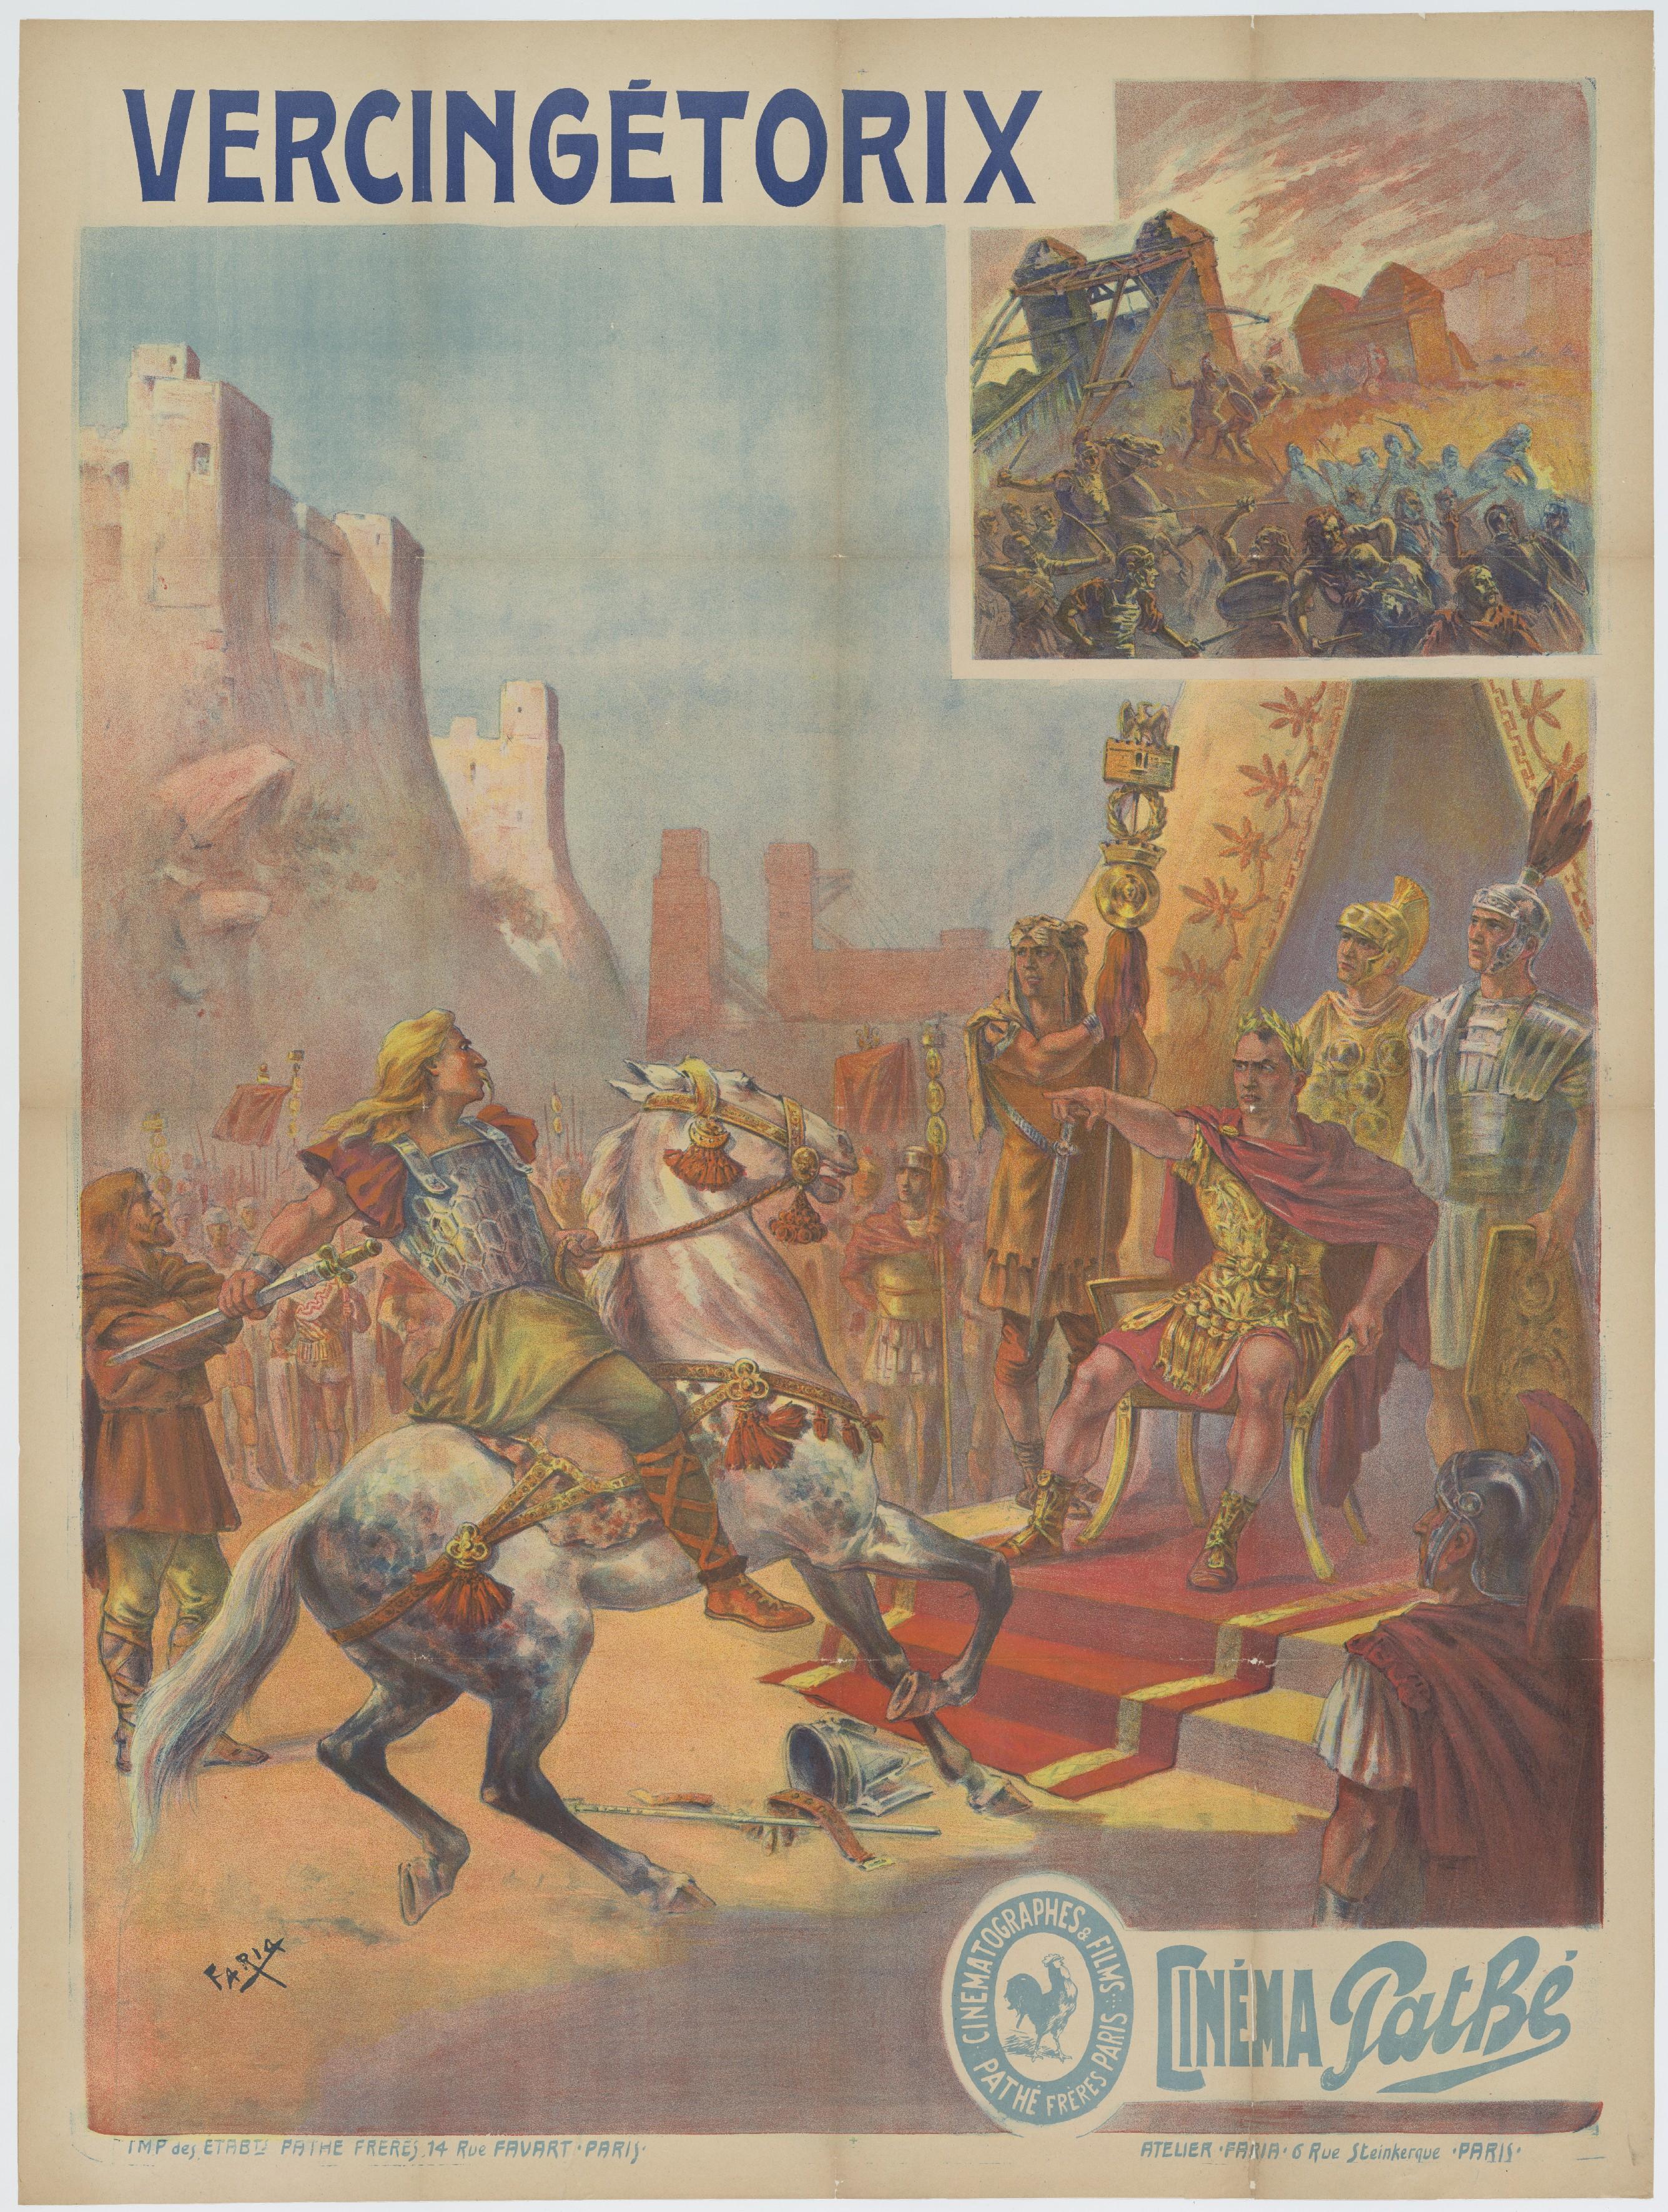 Vercingétorix La Légende Du Druide Roi : vercingétorix, légende, druide, Vercingetorix, Popular, Culture, Wikipedia